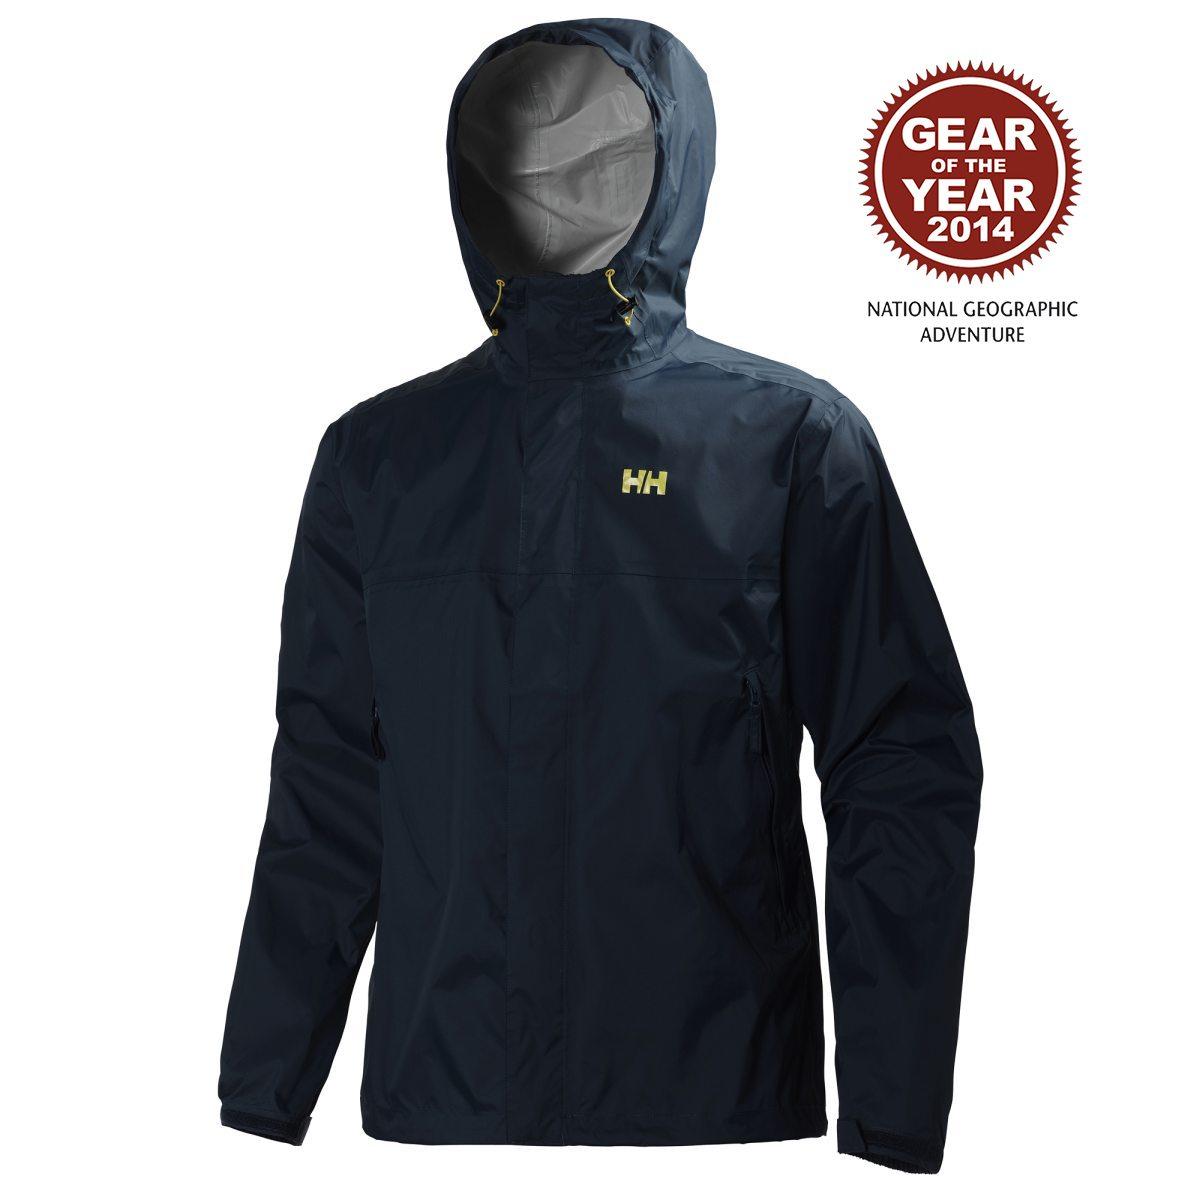 69905e85 Find hansen regnjakke med. Shop every store on the internet via ...